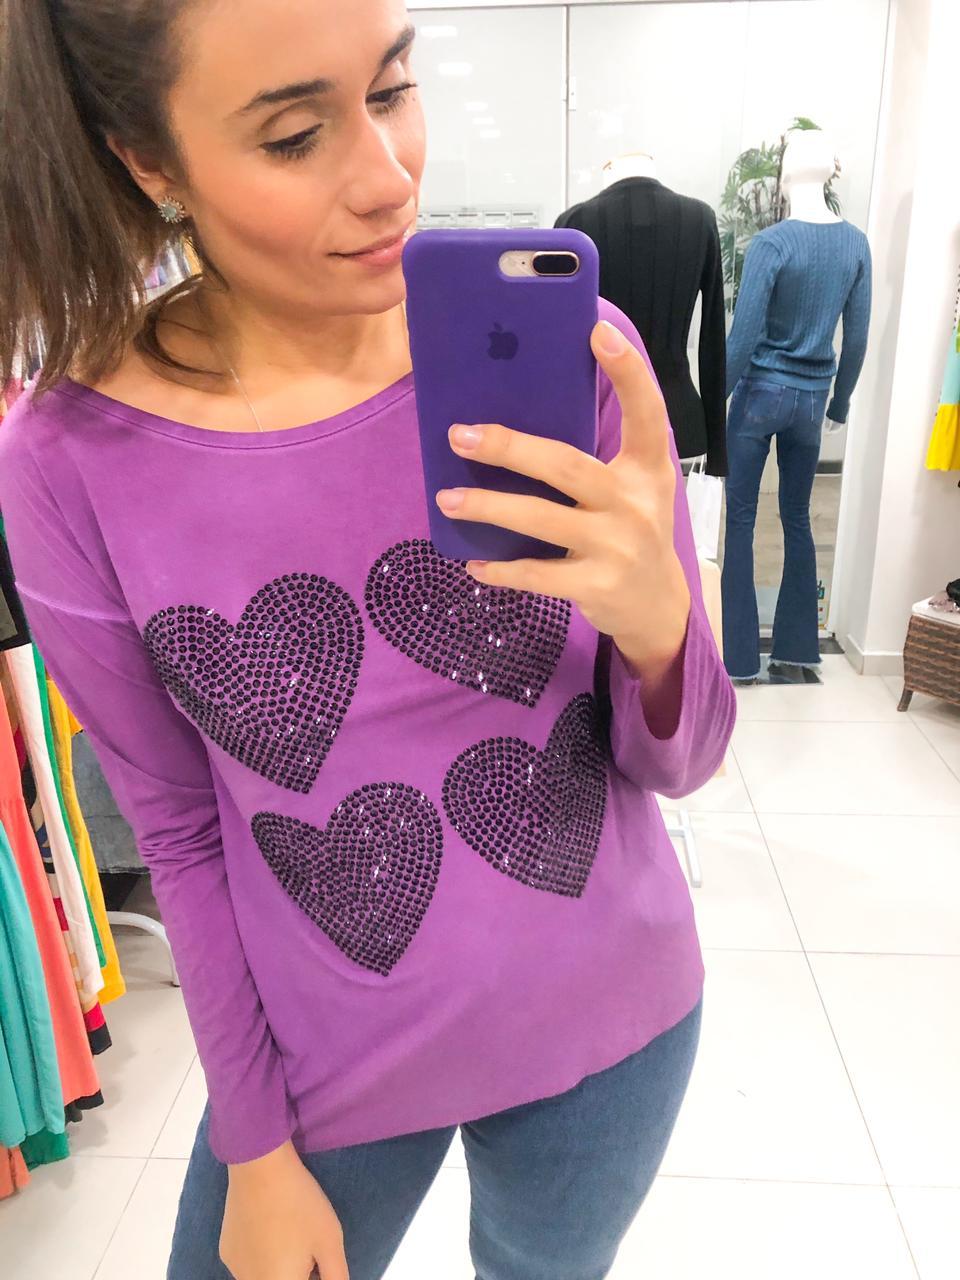 Camiseta 4 coração manga longa